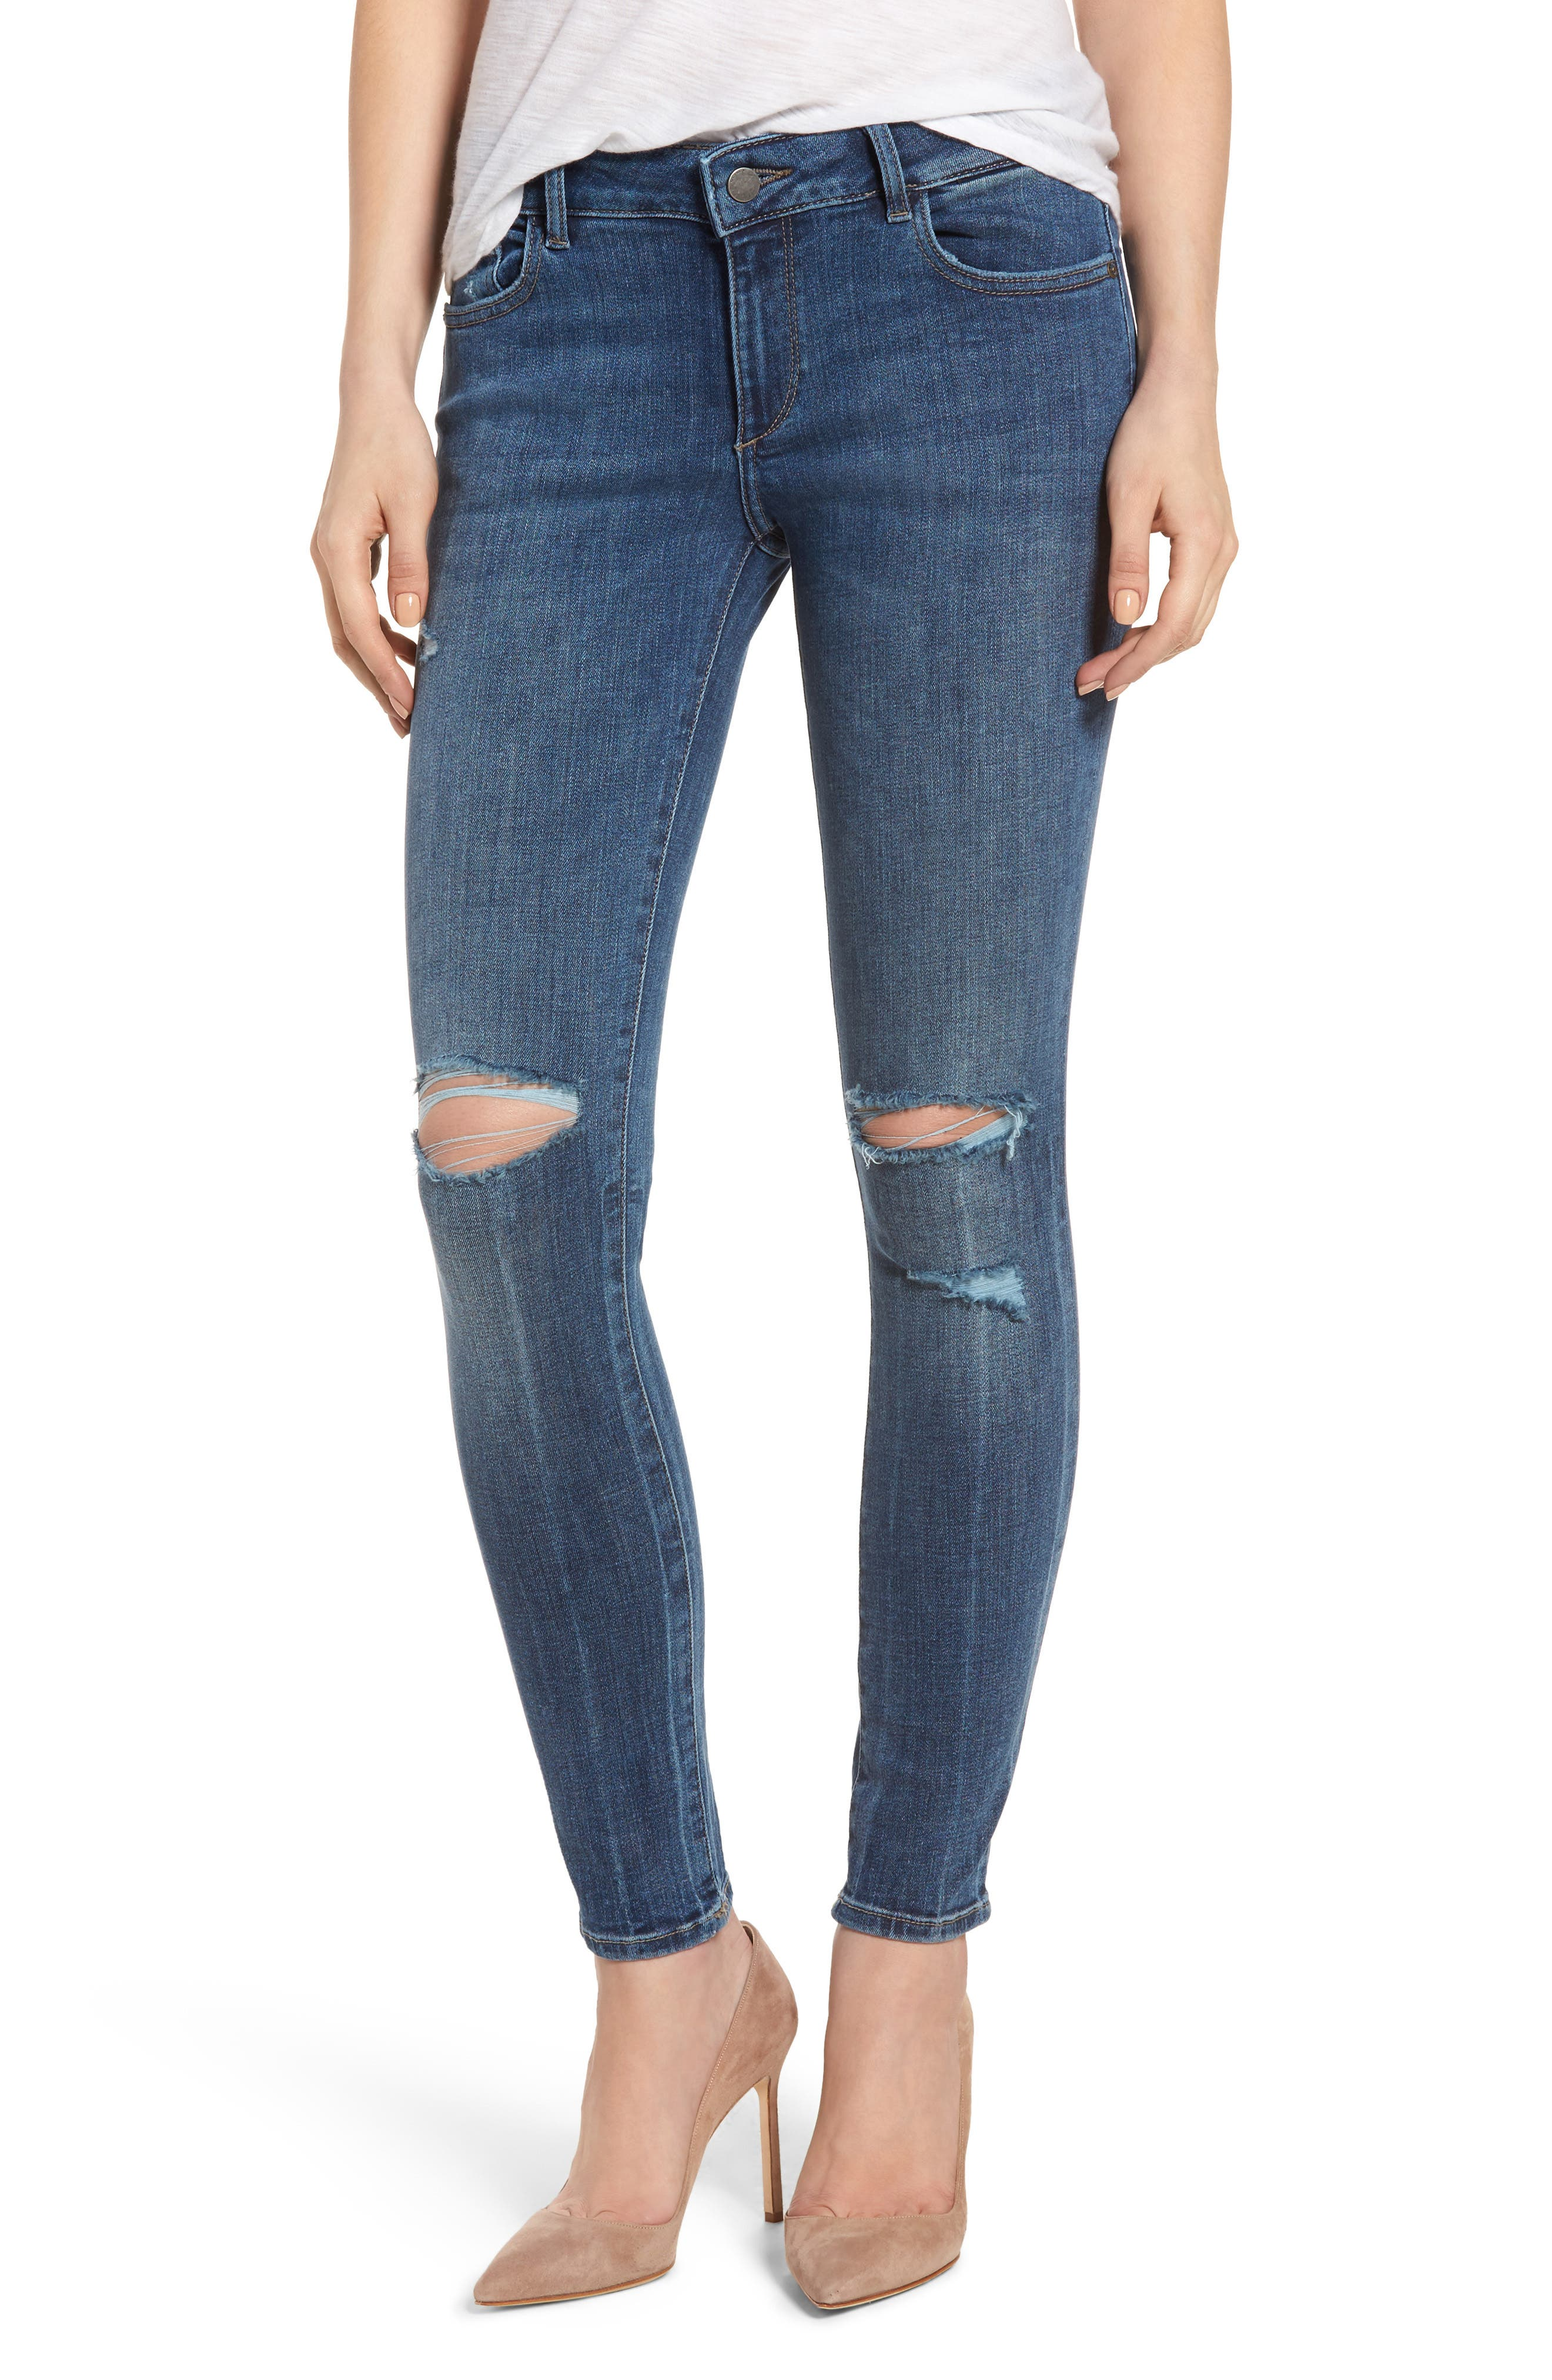 DL1961 Emma Ripped Power Legging Jeans (Pima)